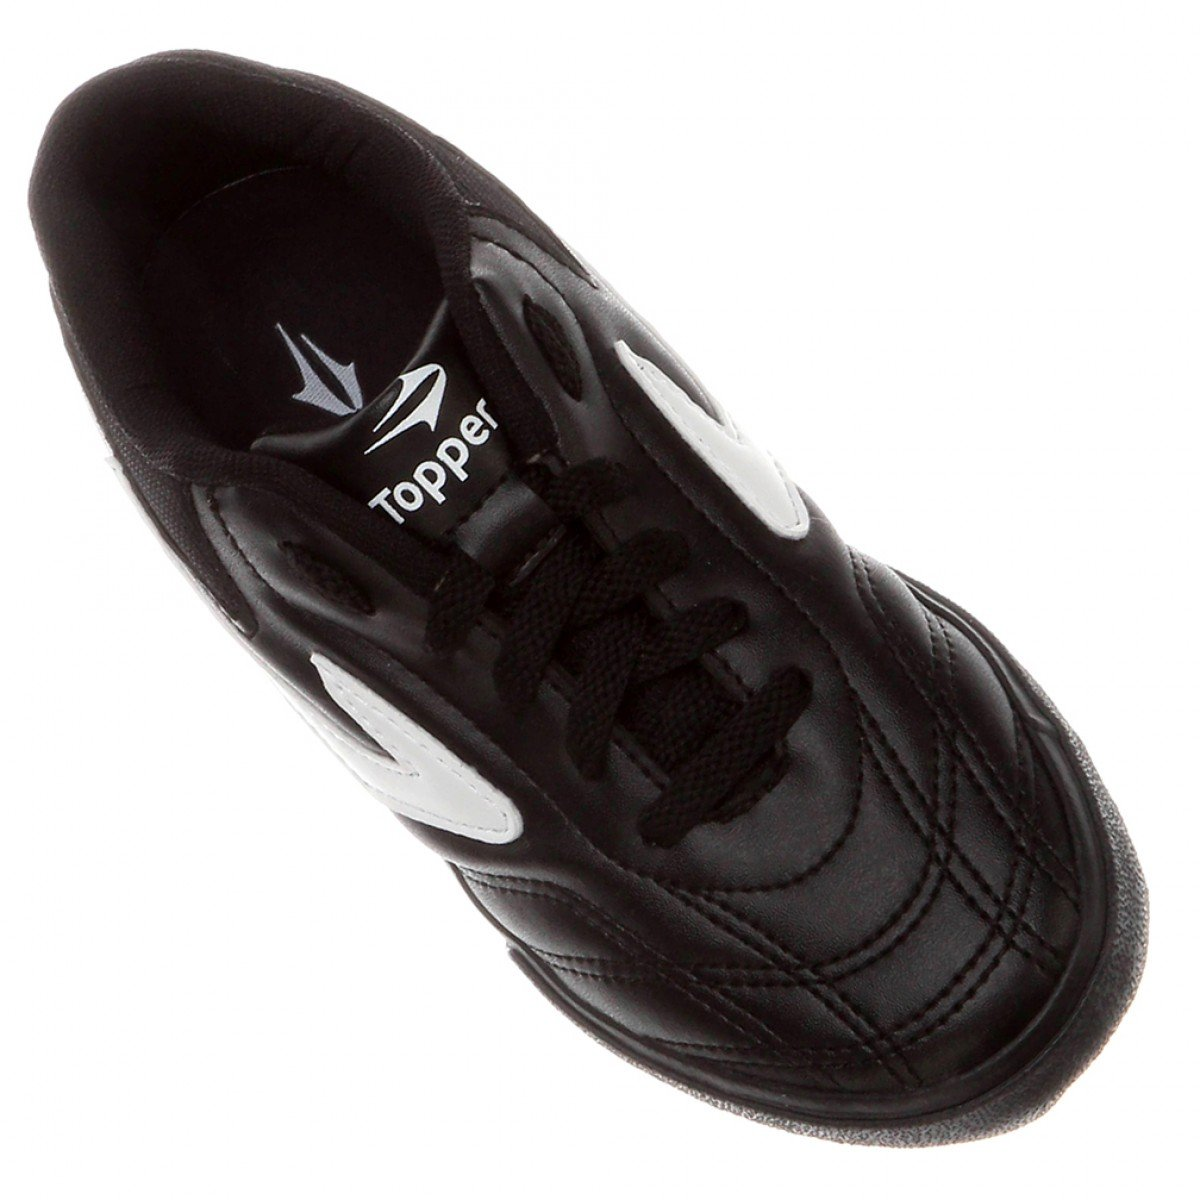 1cf0868694 Chuteira Futsal Infantil Topper Dominator III Preto e Branco ...